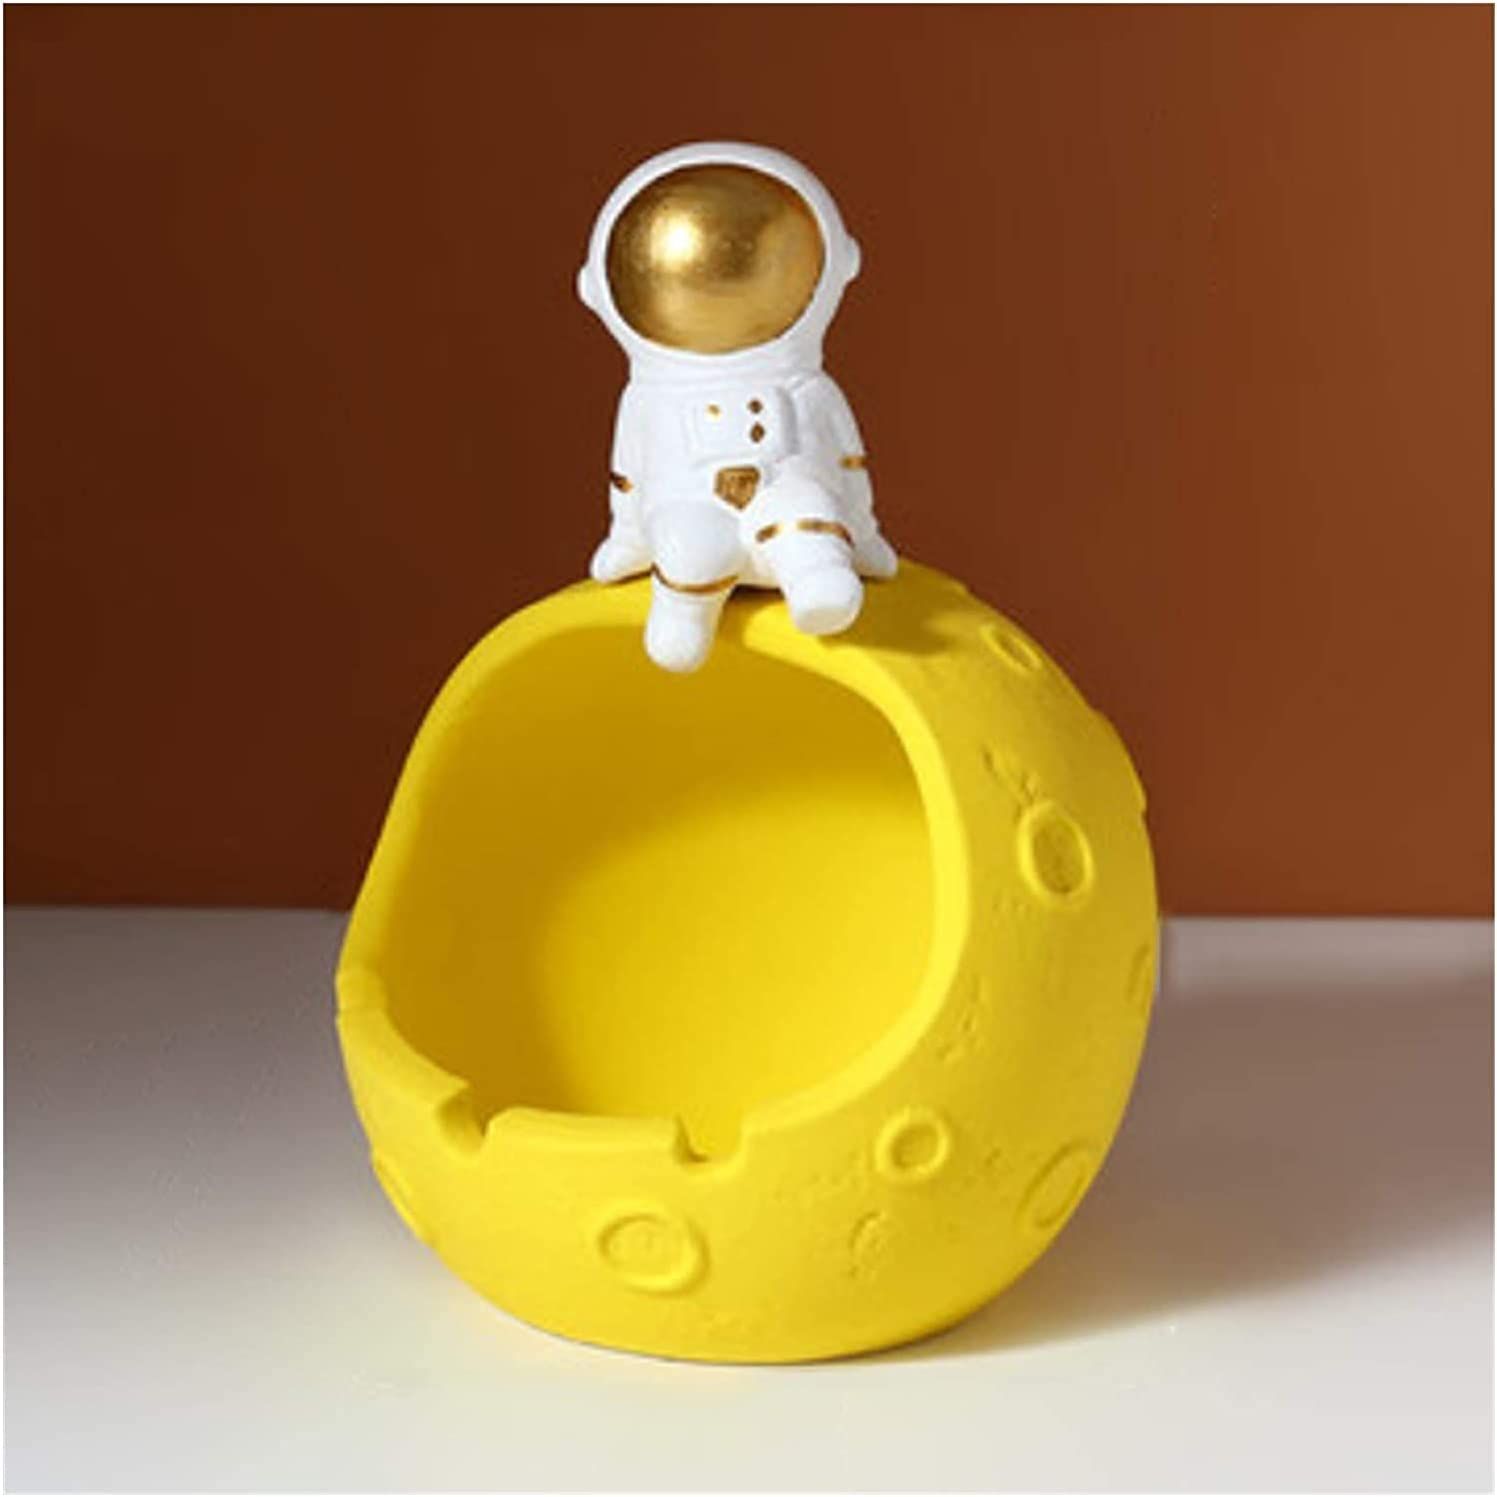 JJDSN Astronaut Ashtray Ceramic Multifunctional Max 66% OFF Quantity limited Cigar